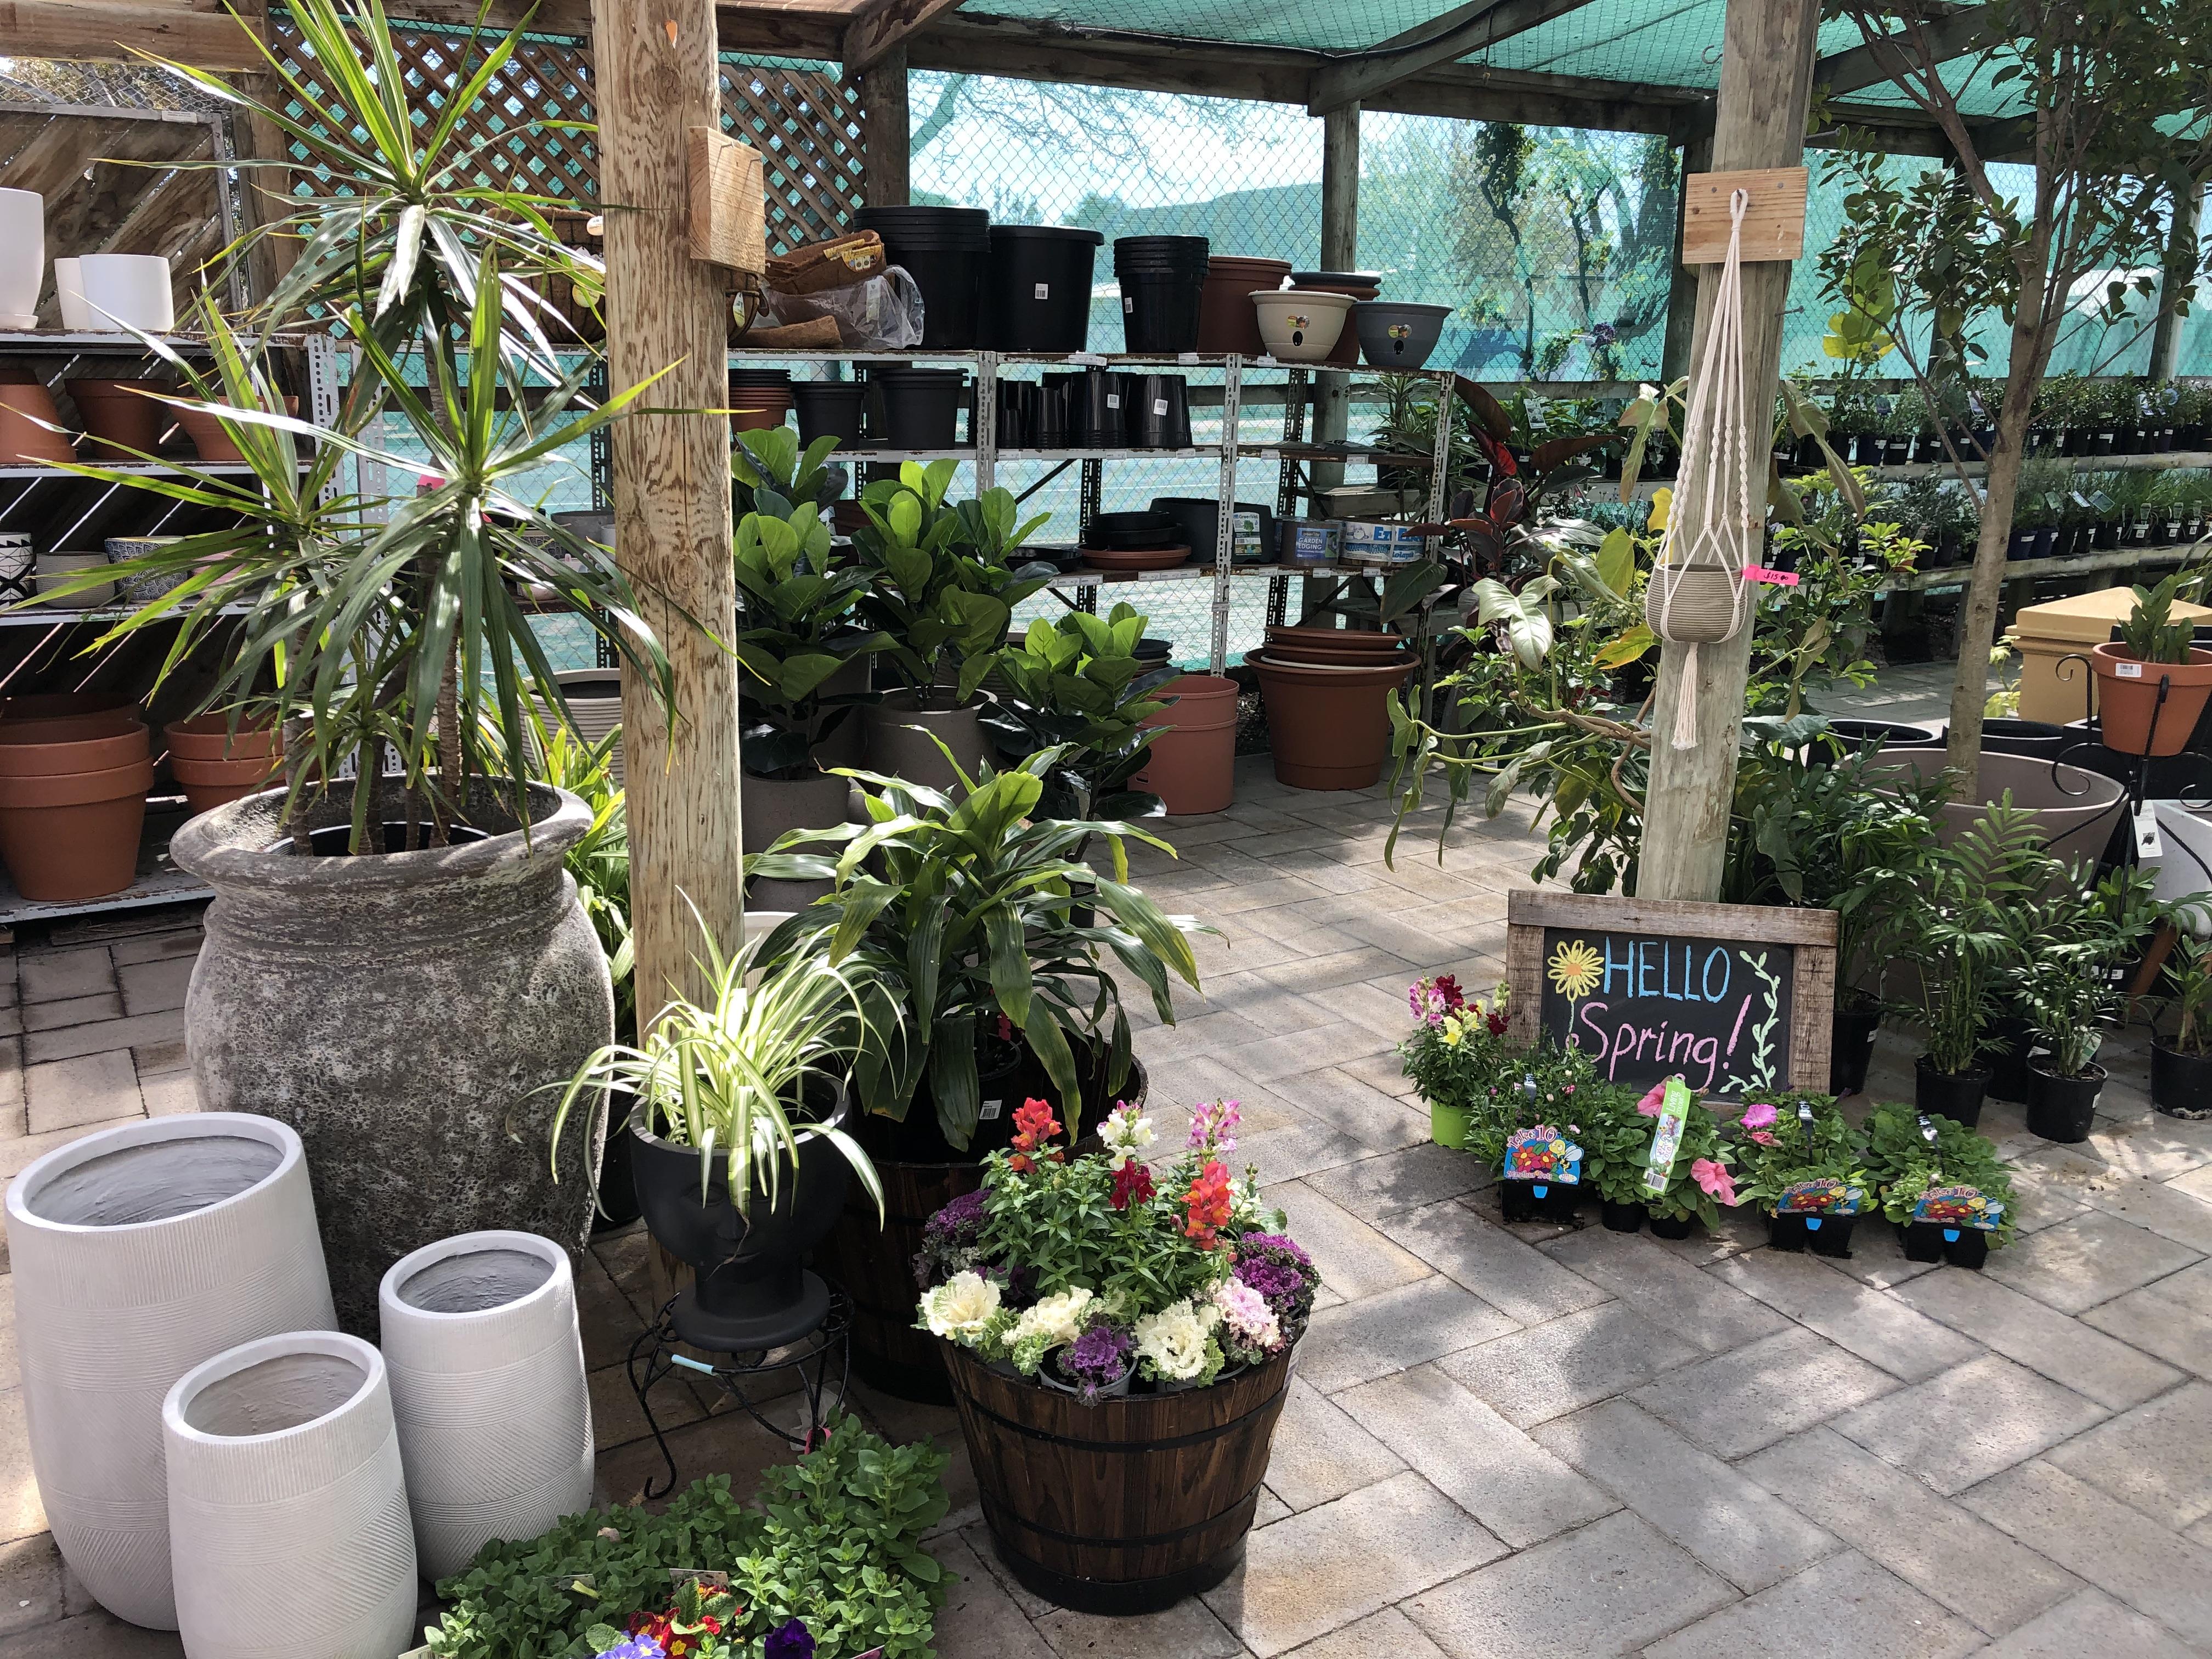 Garden Centre at Popes